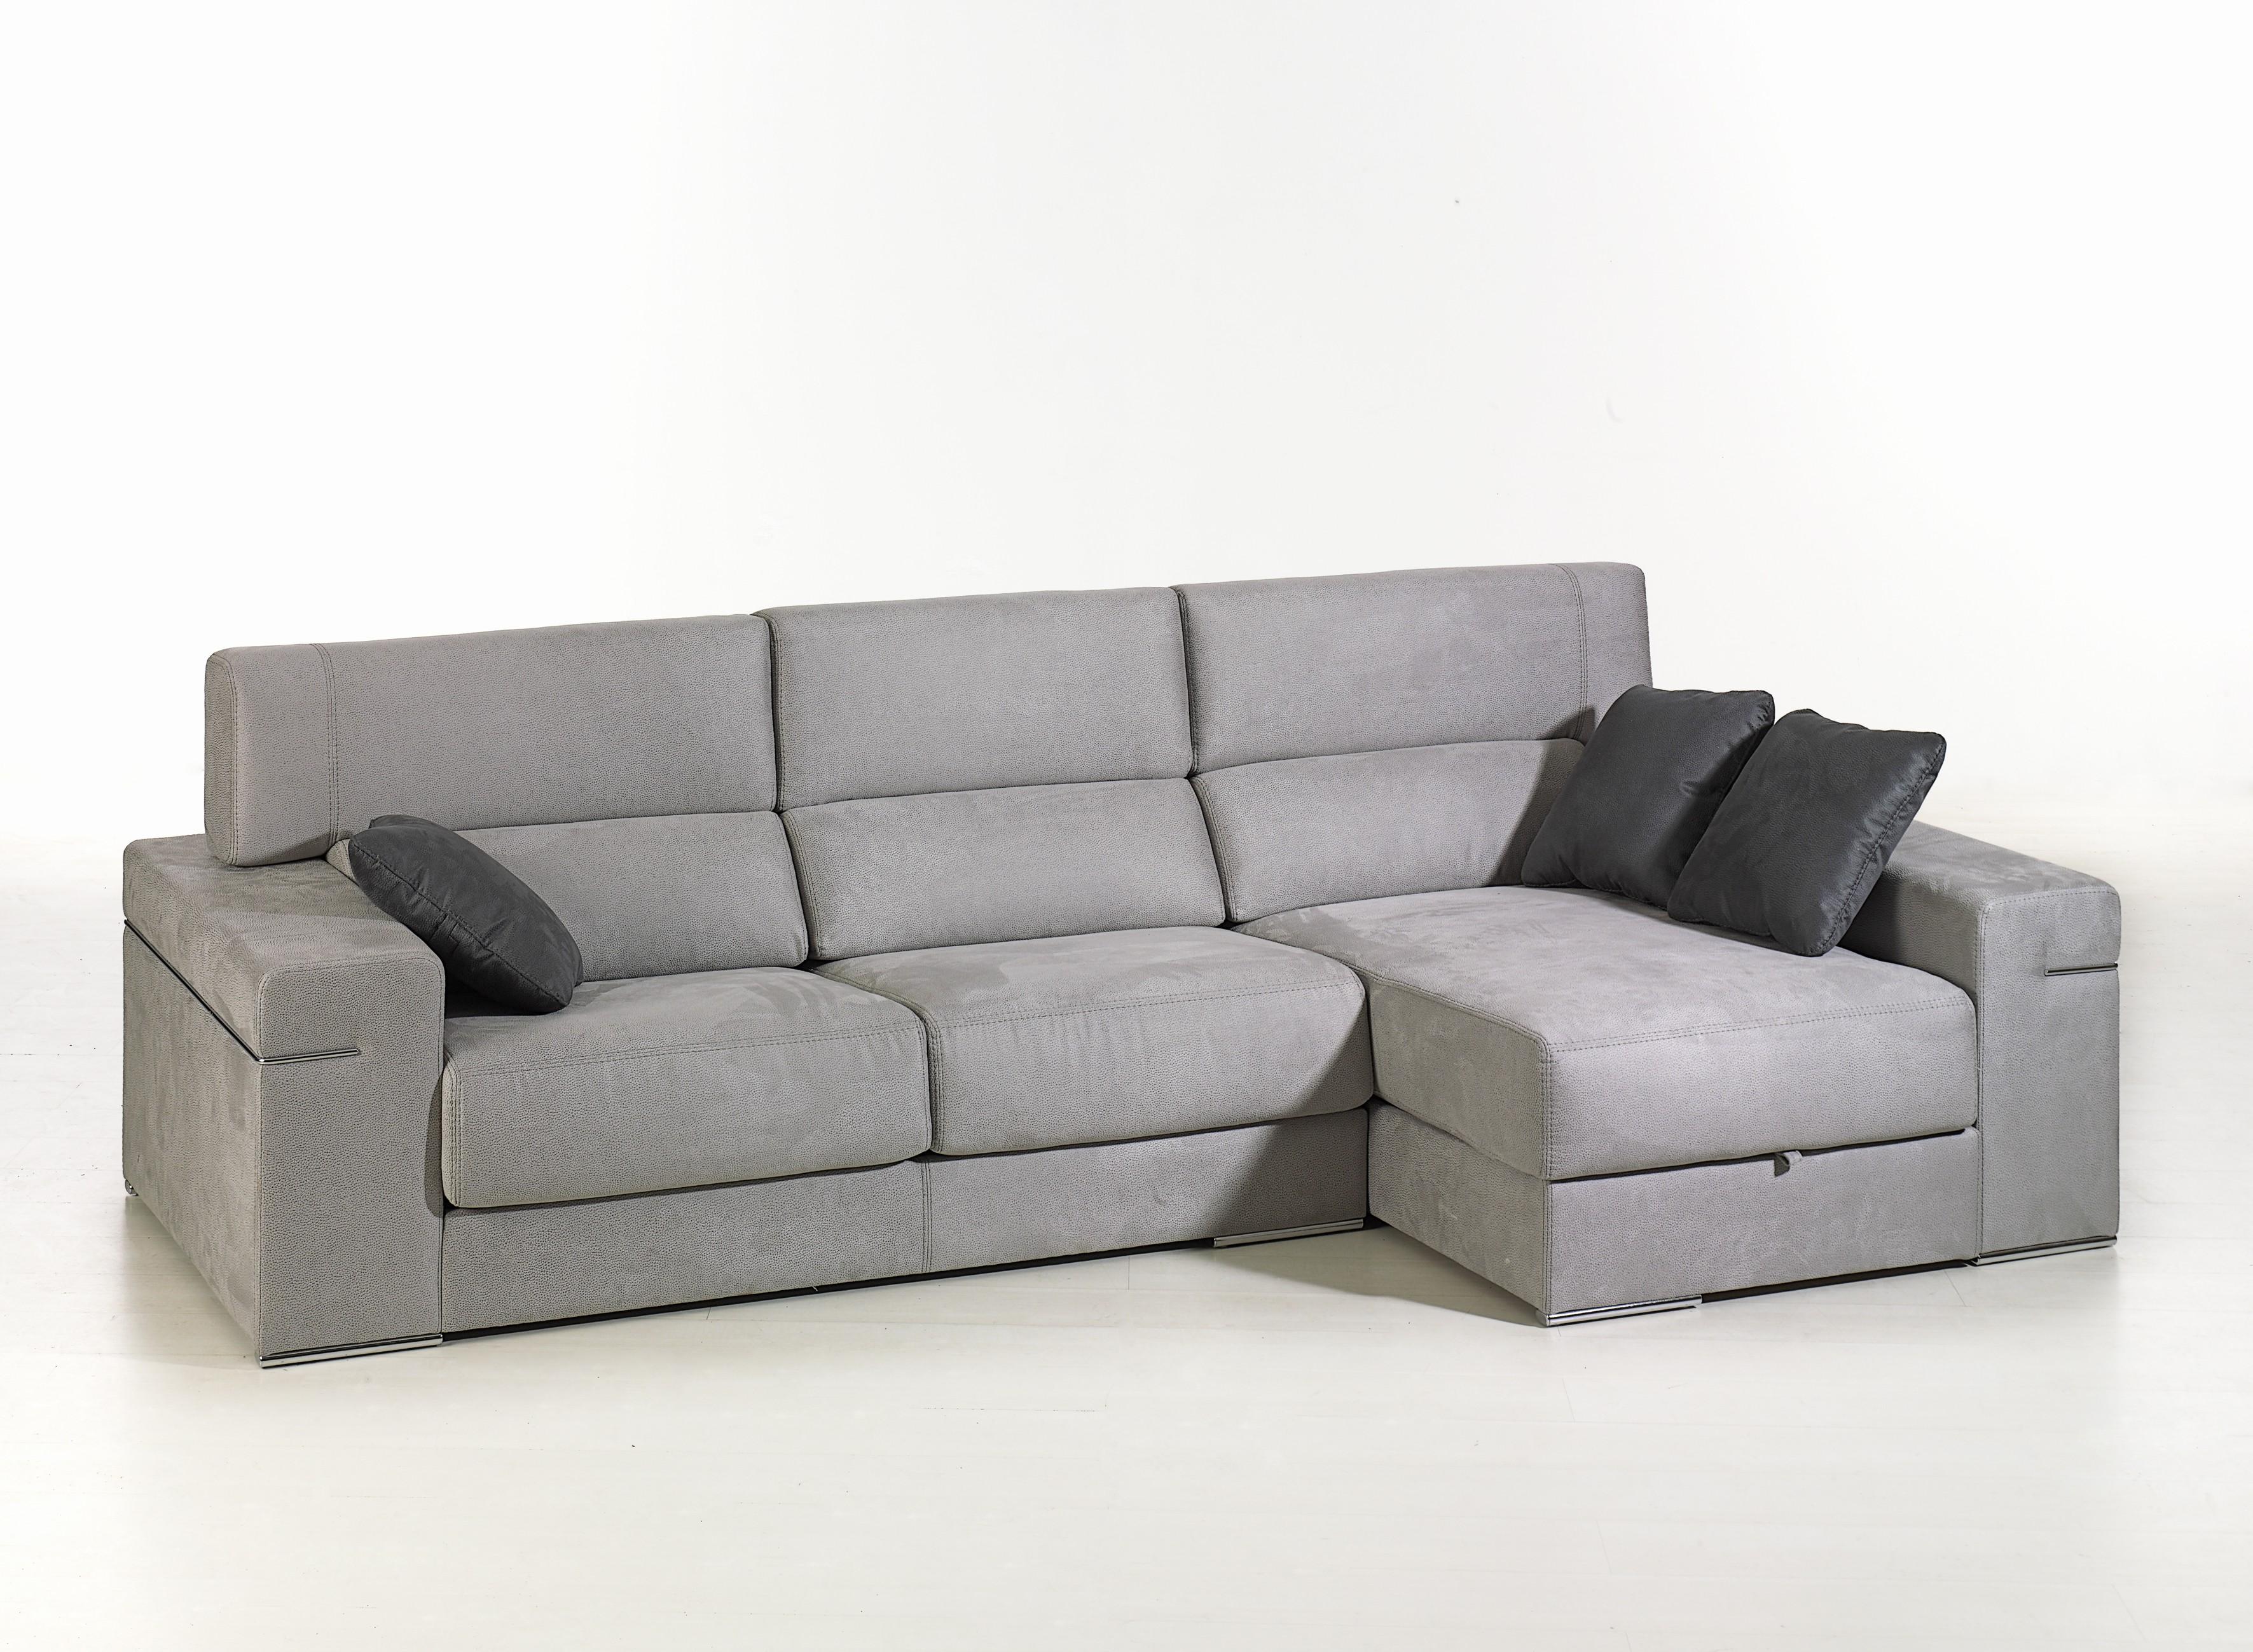 Muebles en miranda do douro excellent contactar with - Fabrica muebles portugal ...